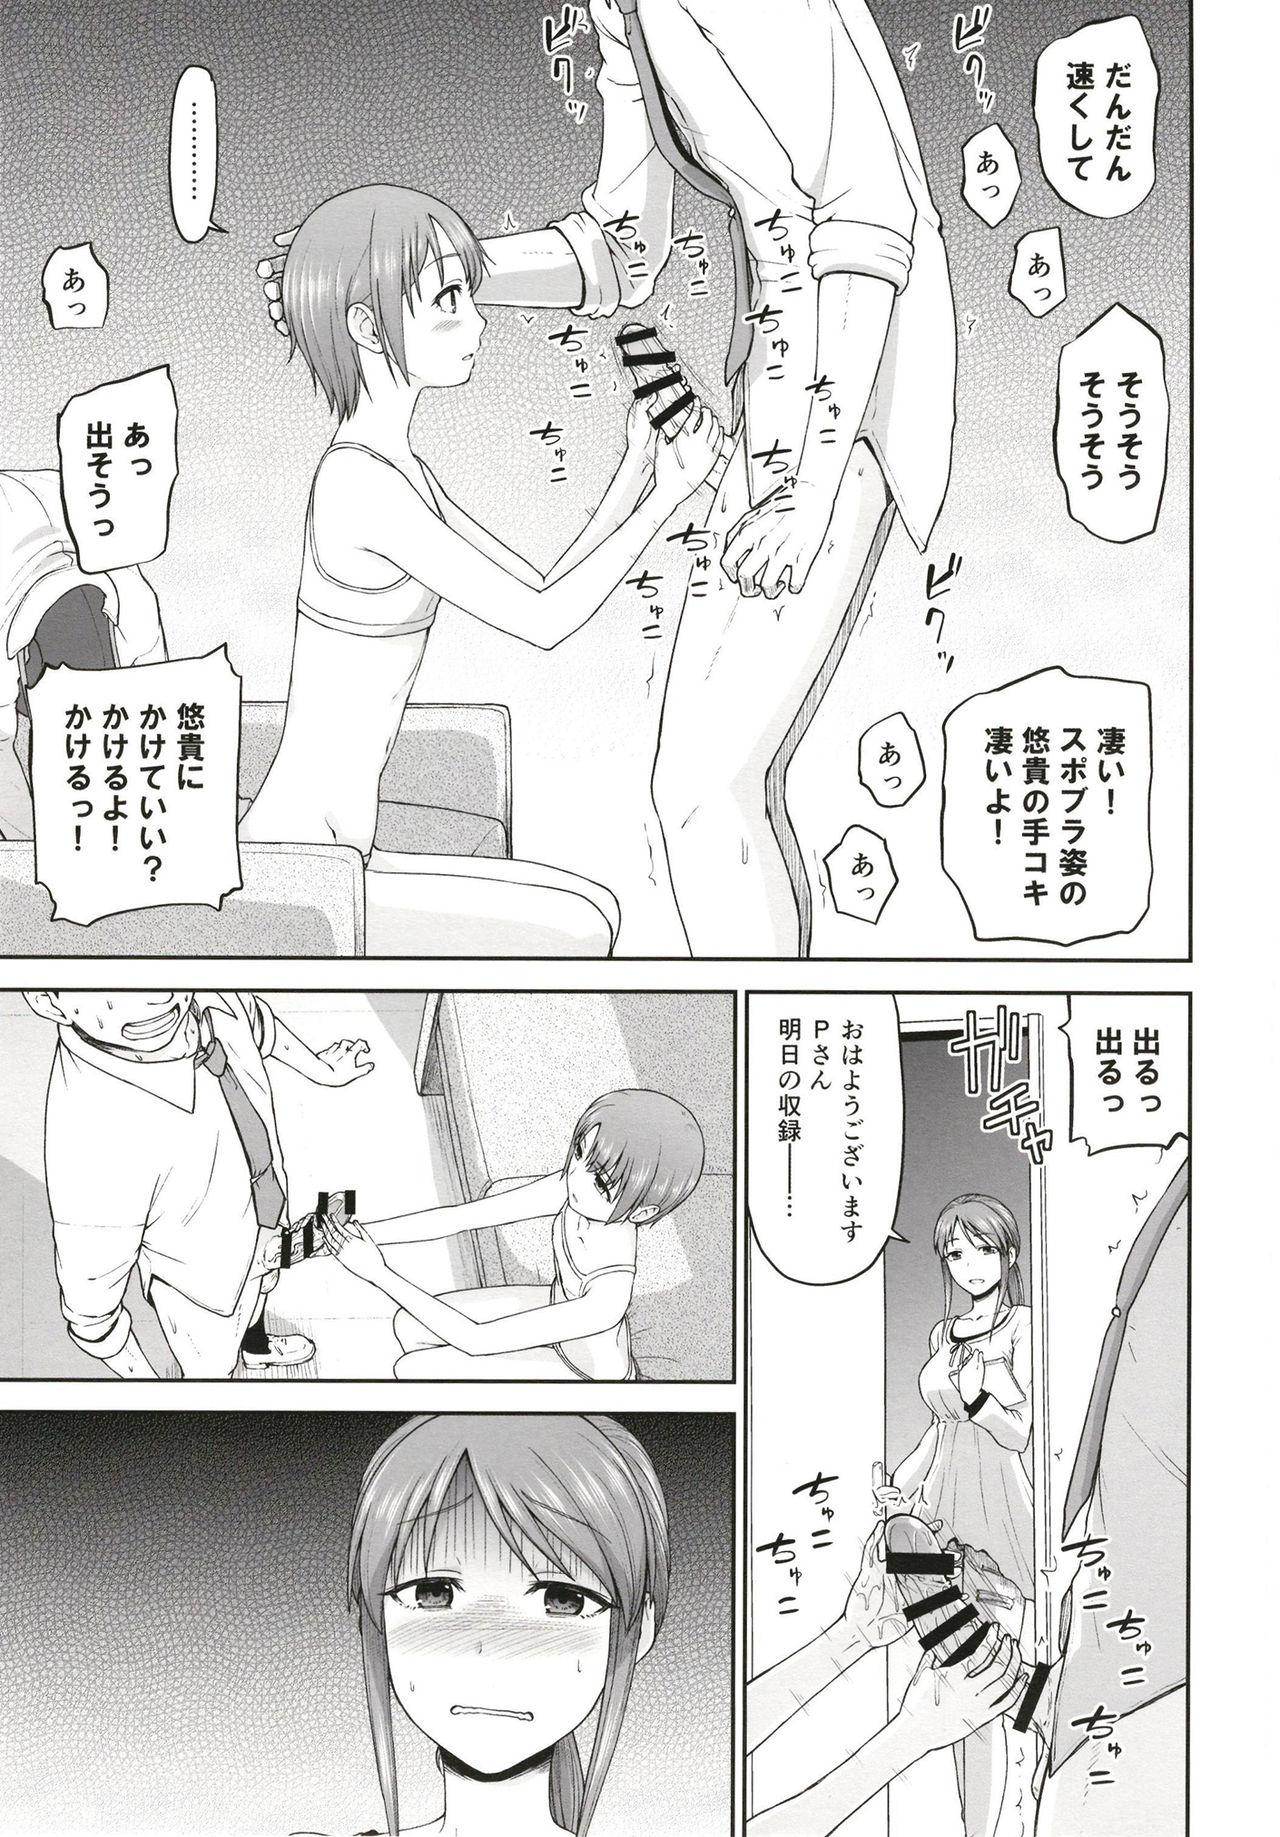 [Koppun (Hone)] Mifune-san to Otokura-chan to Saimin Sex (THE IDOLM@STER CINDERELLA GIRLS) [Digital] 4